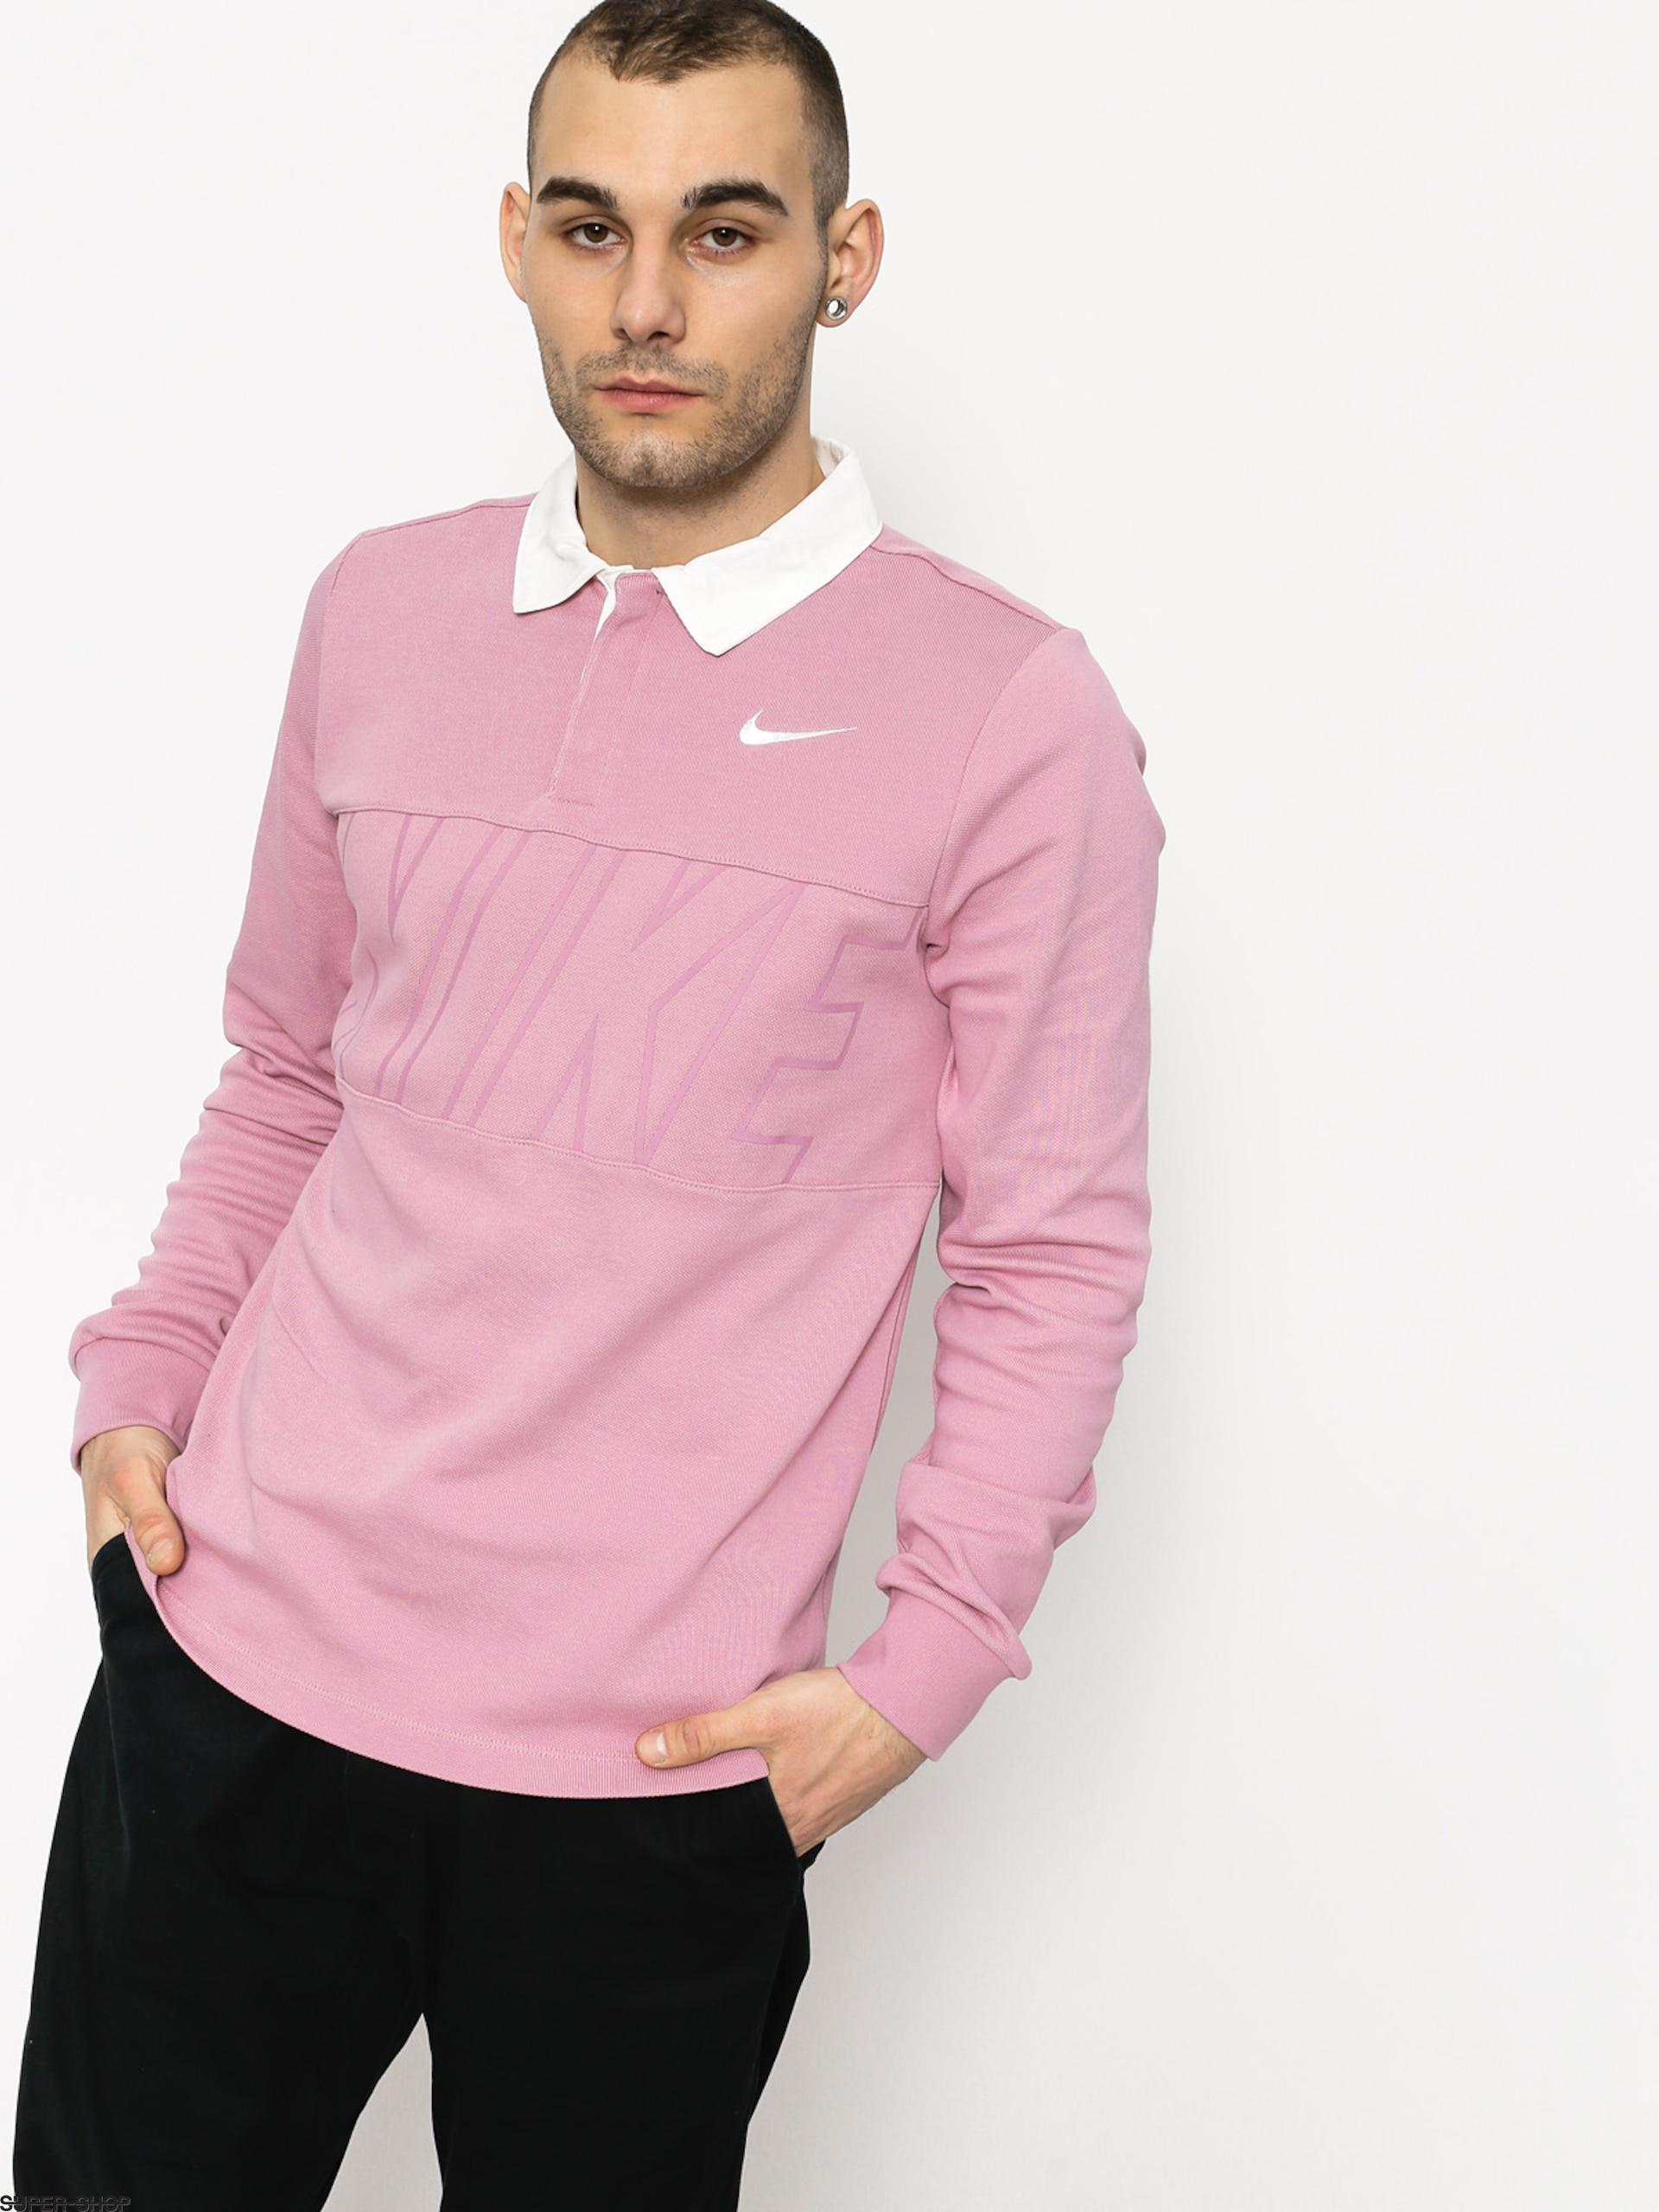 f52352323fd 915478-w1920-nike-sb-longsleeve-dry-top-rugby-elemental-pink-white.jpg